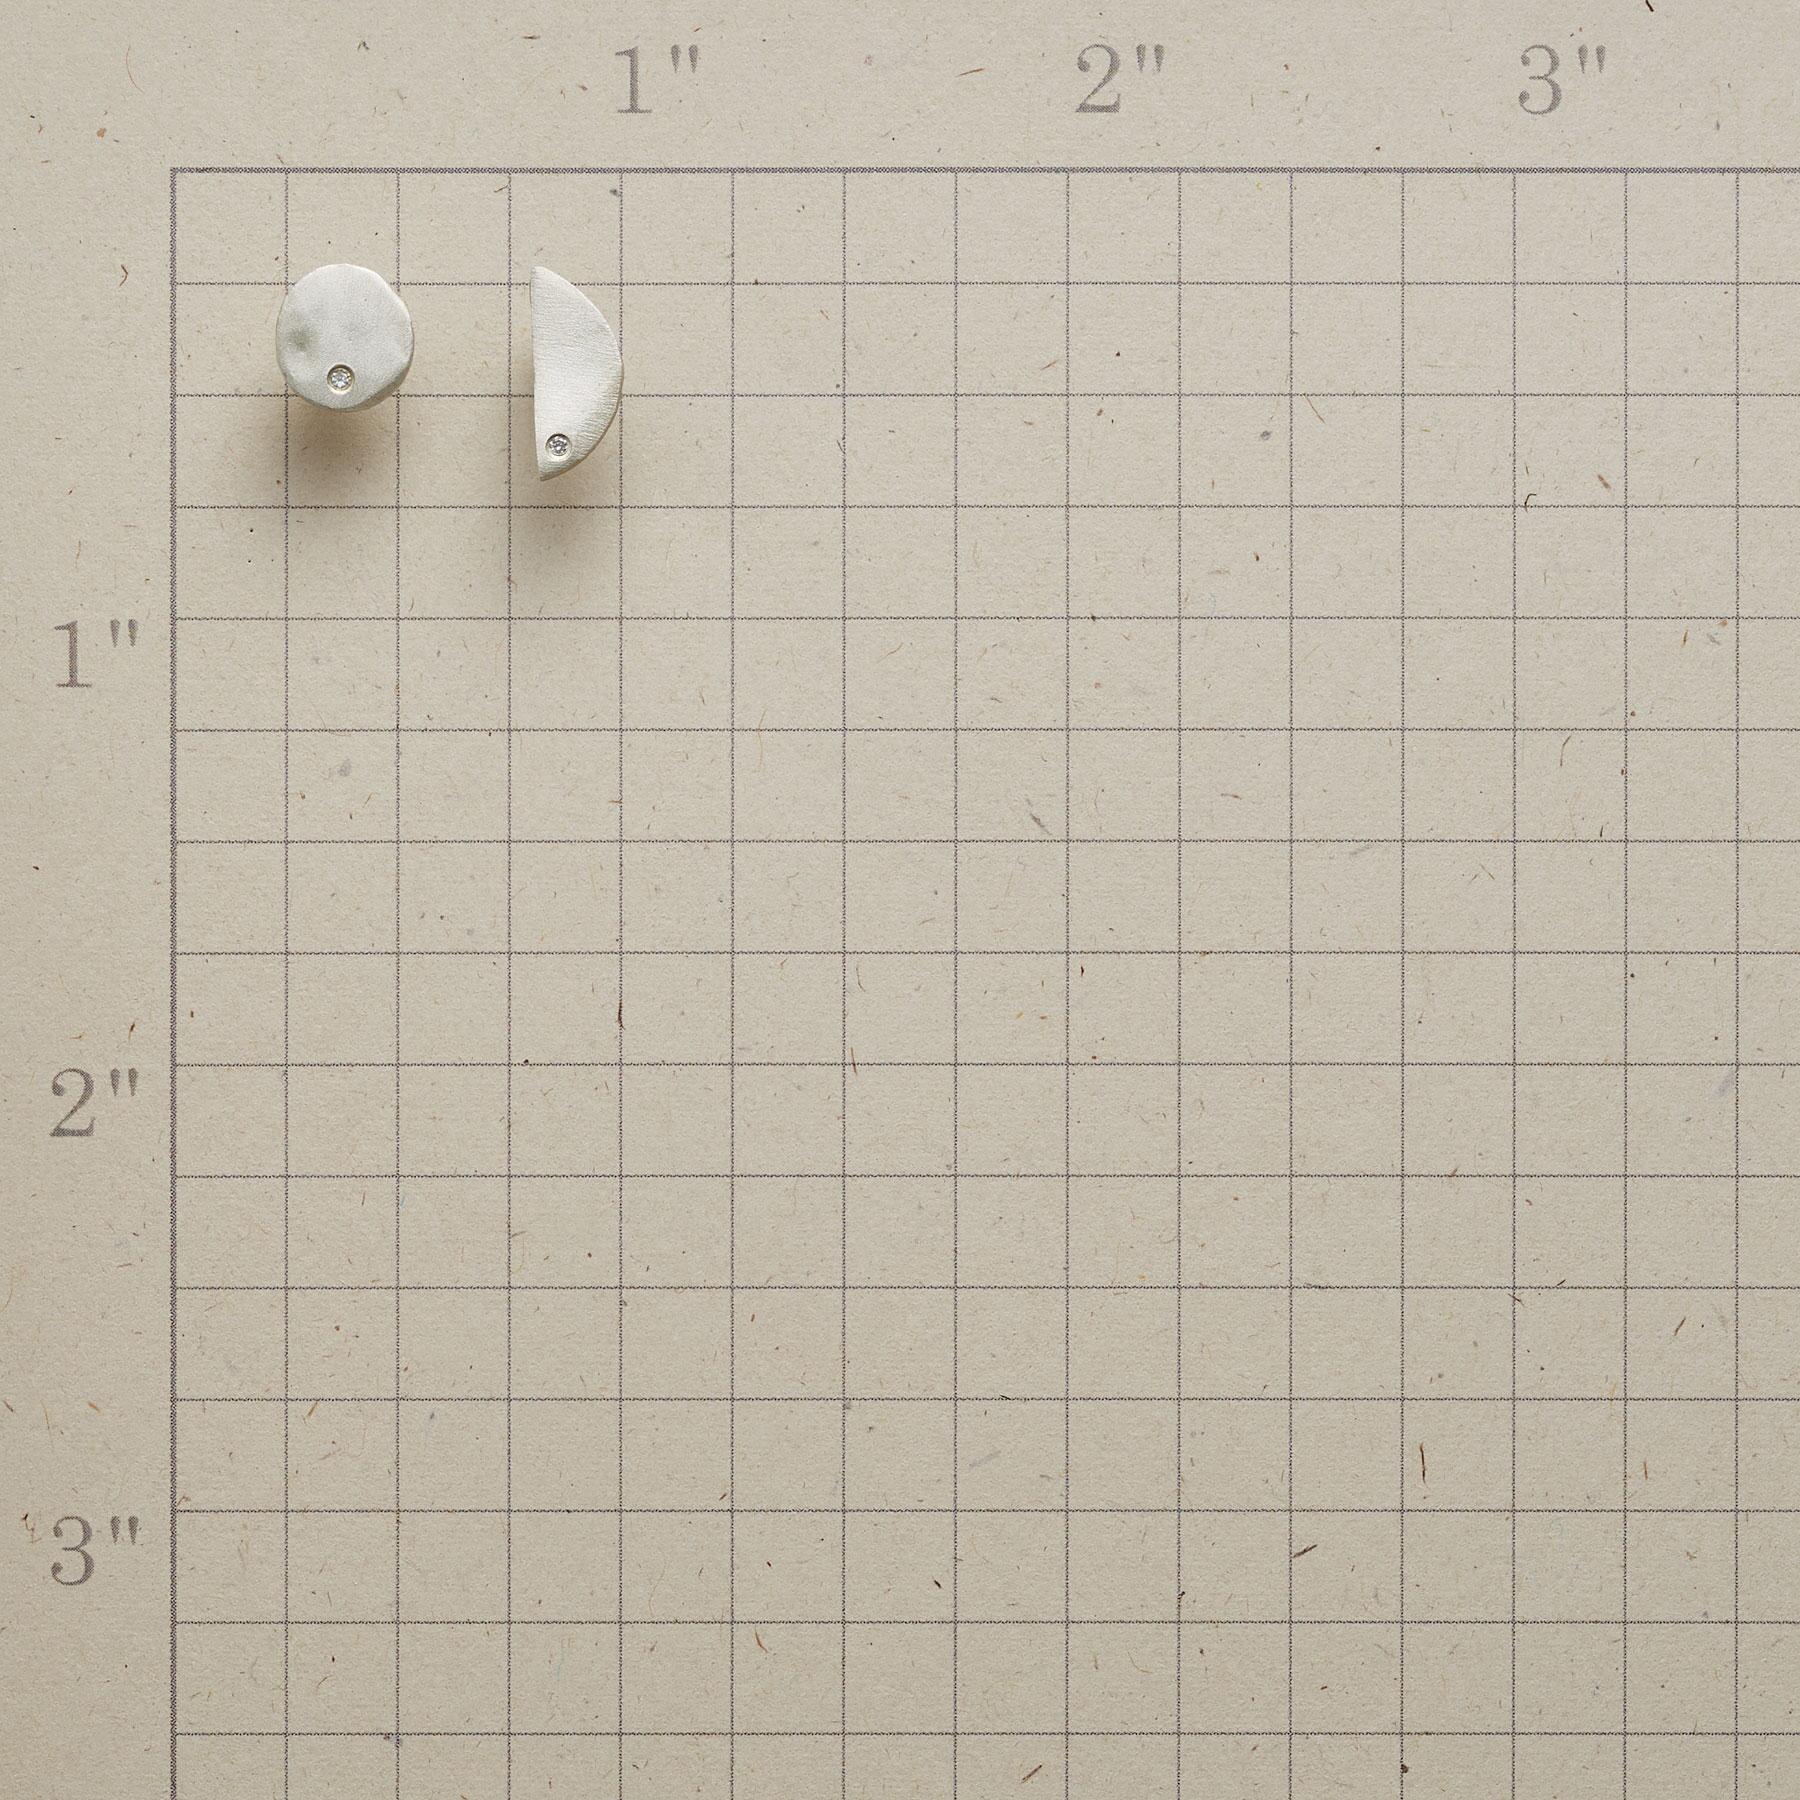 TWO MOONS DIAMOND EARRINGS: View 2